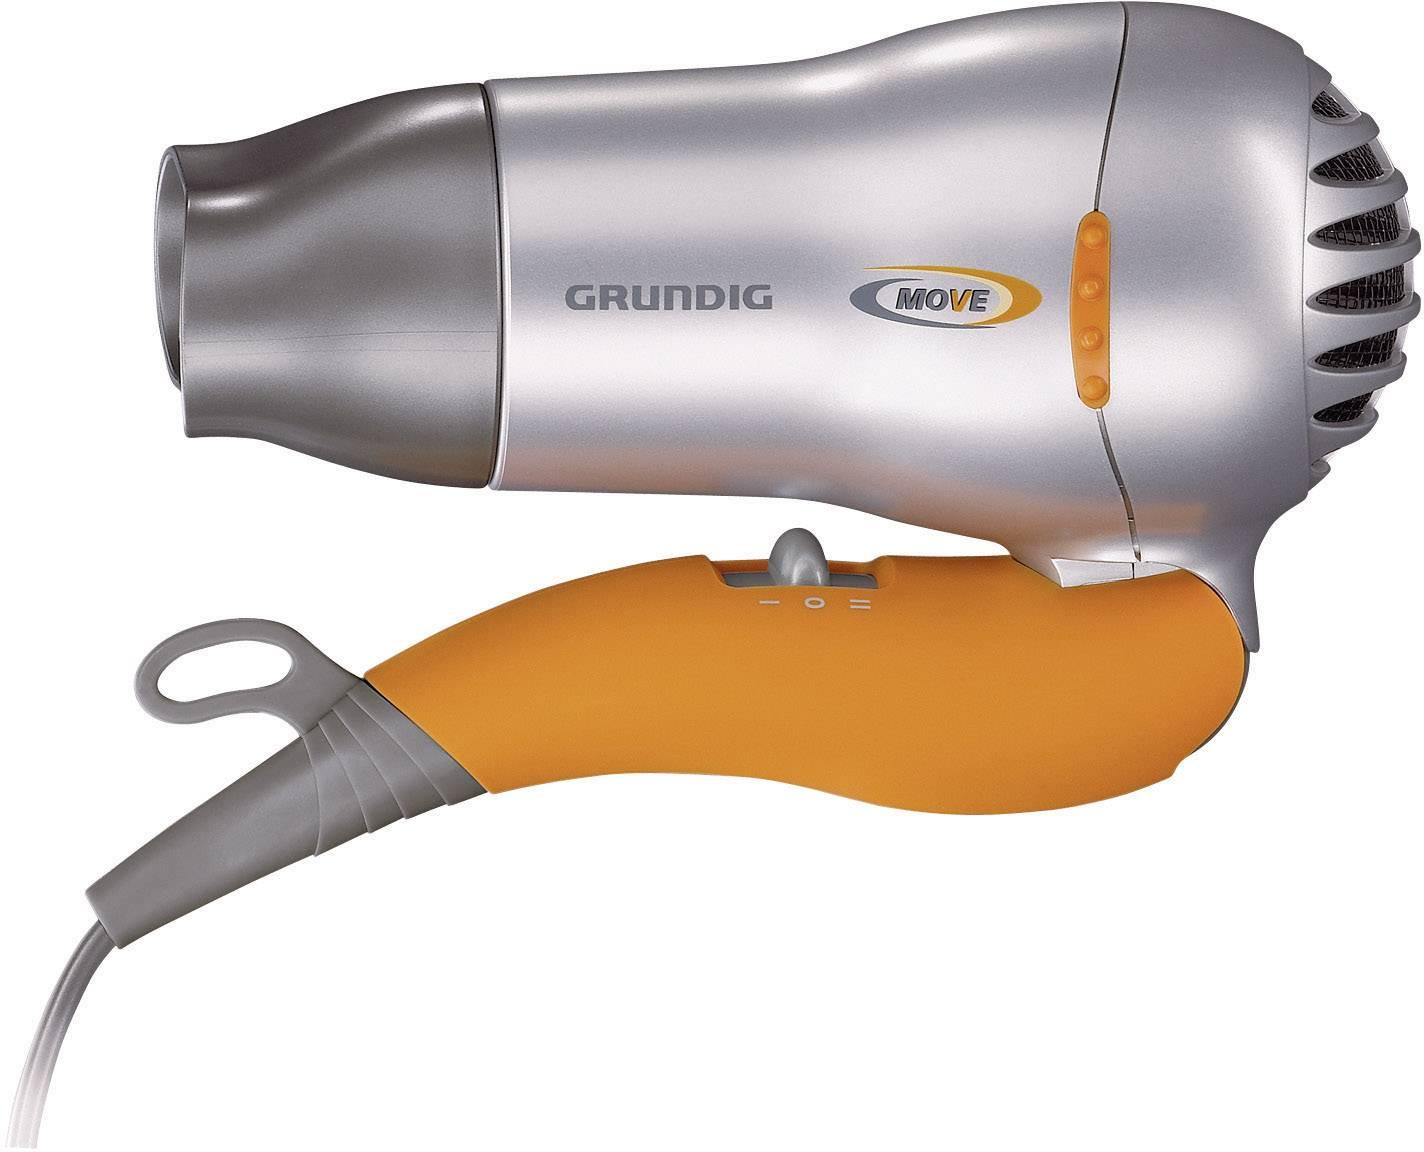 Fén na vlasy Grundig GMK8600, 1500 W, stříbrná, oranžová